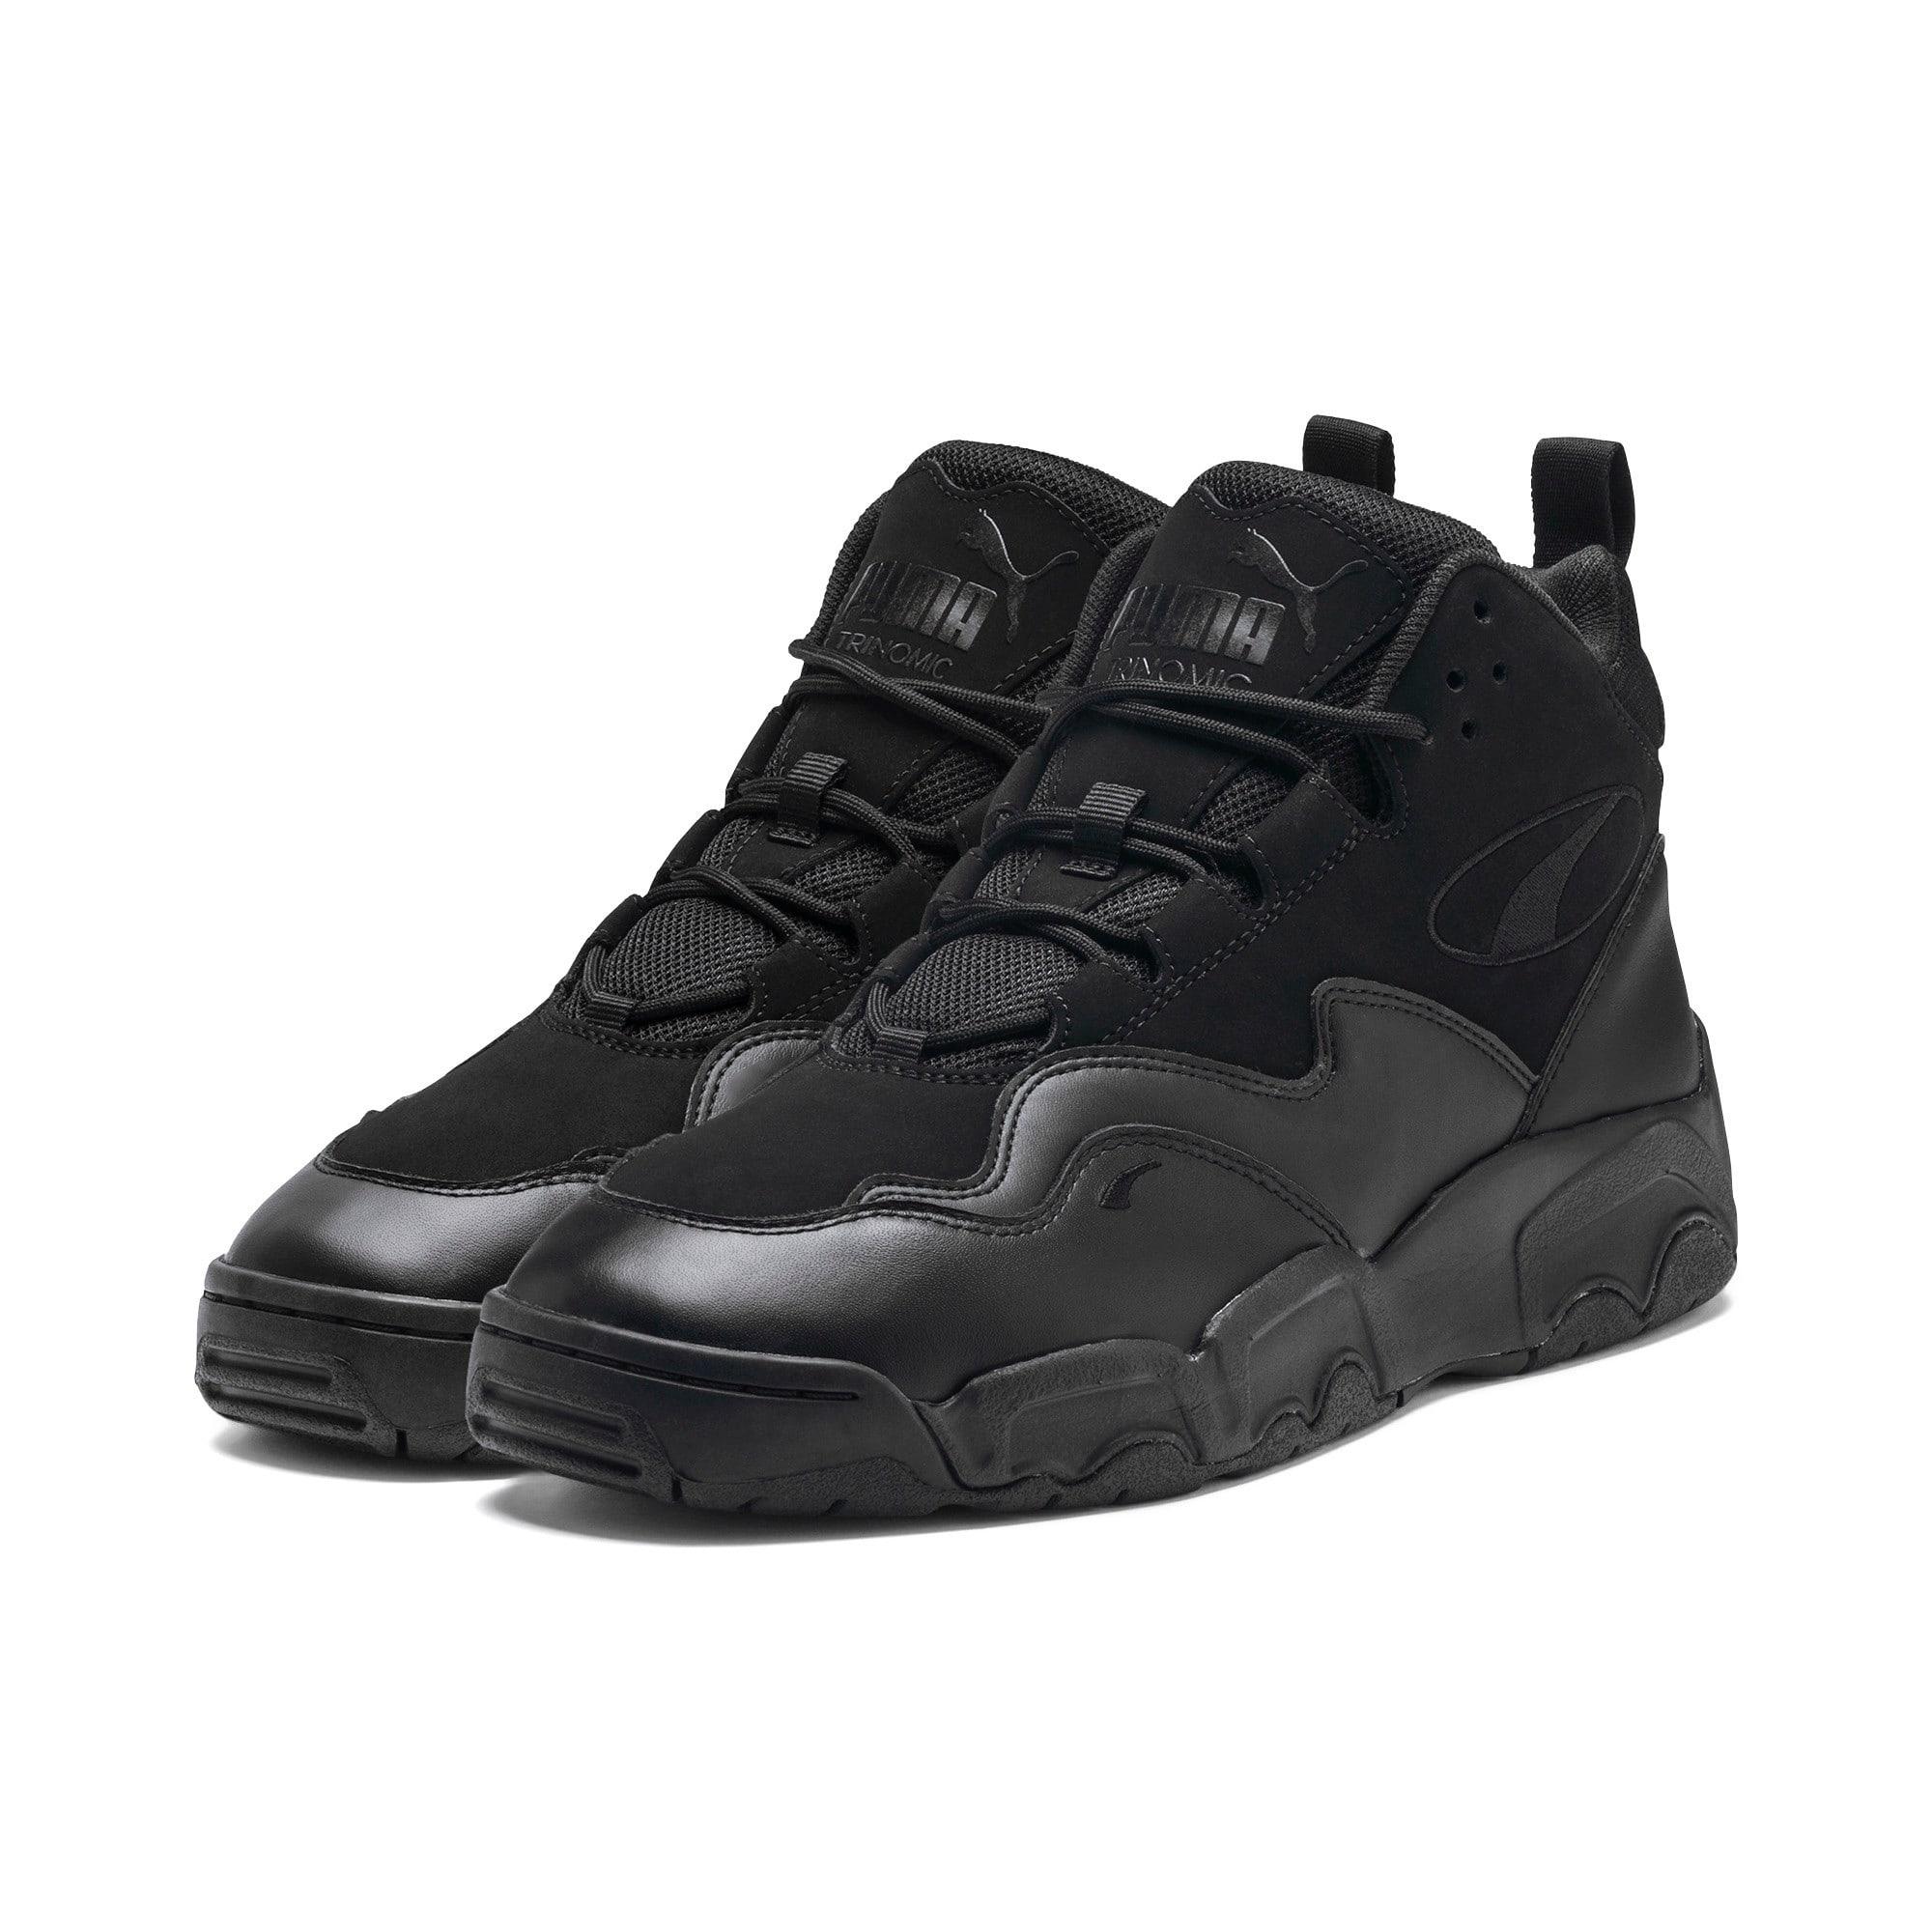 Thumbnail 2 of Source Mid Sneakers, Puma Black, medium